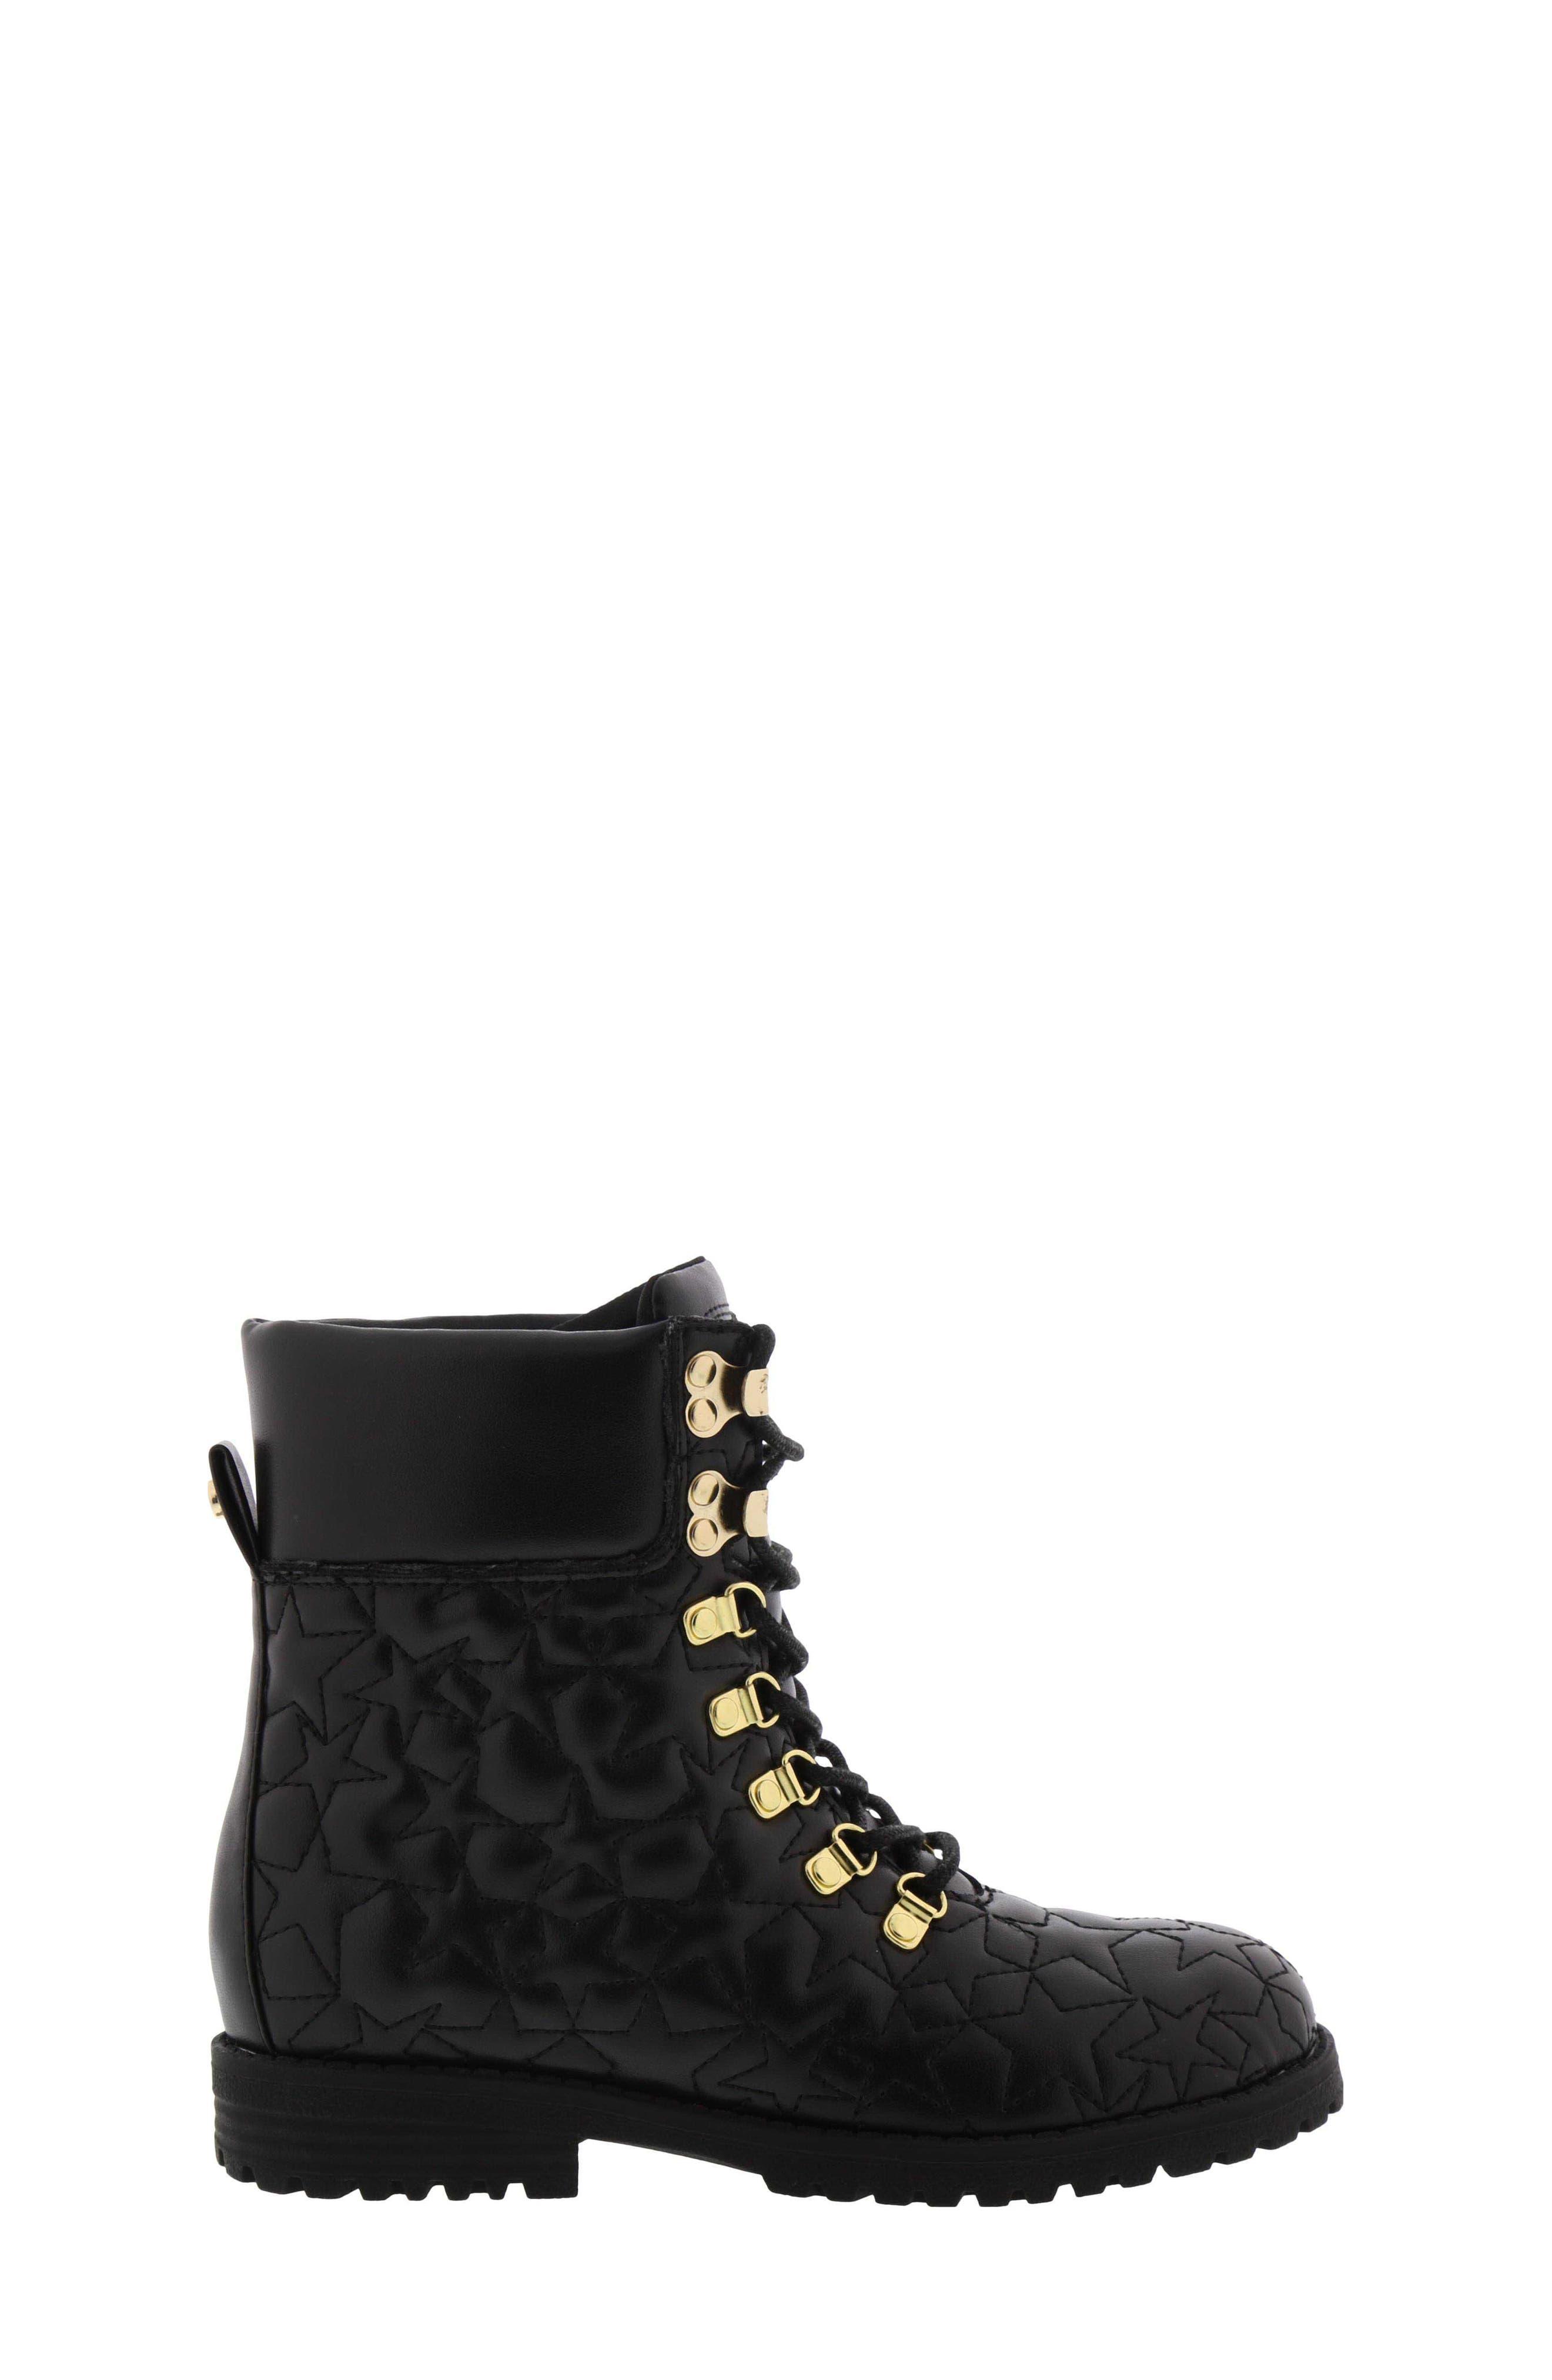 Sam Edelmen Jess Star Quilted Boot,                             Alternate thumbnail 3, color,                             BLACK GOLD